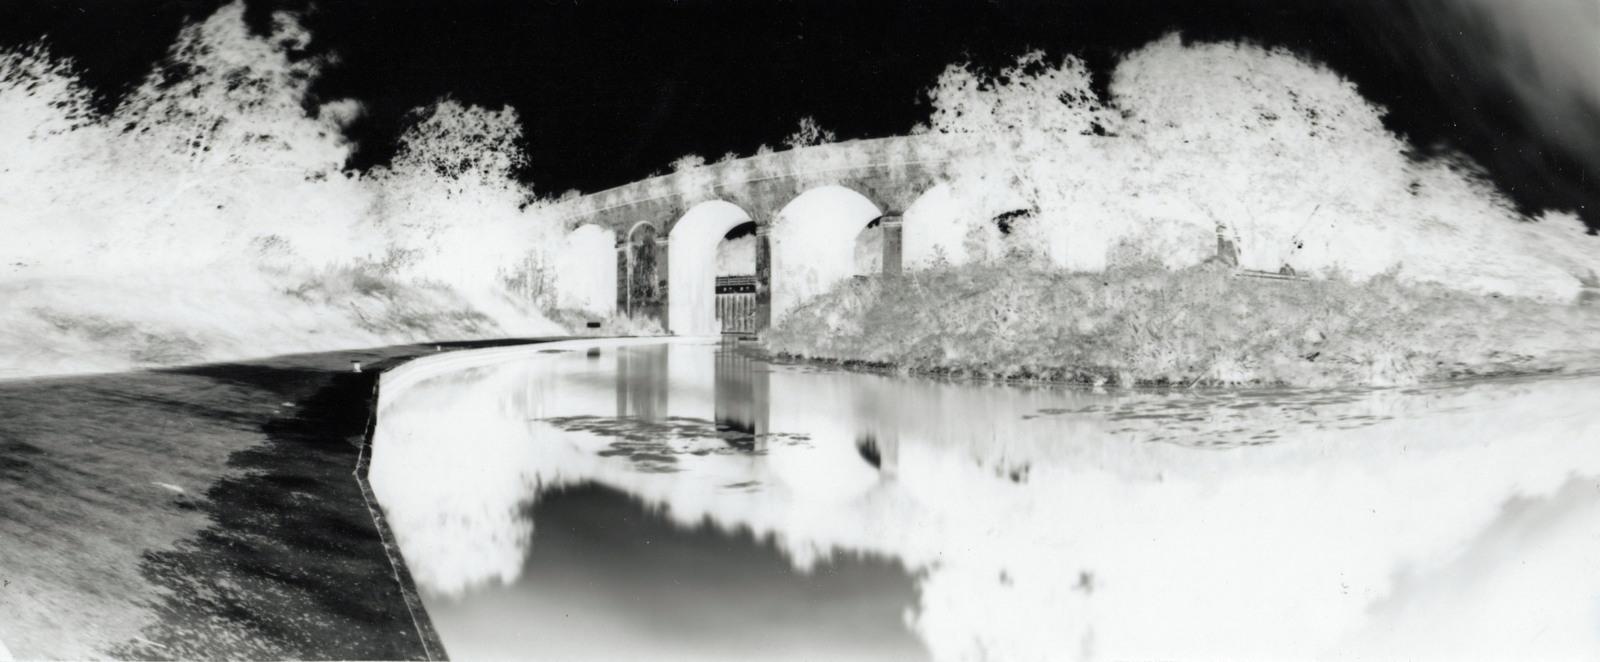 4. Capel's Mill Viaduct